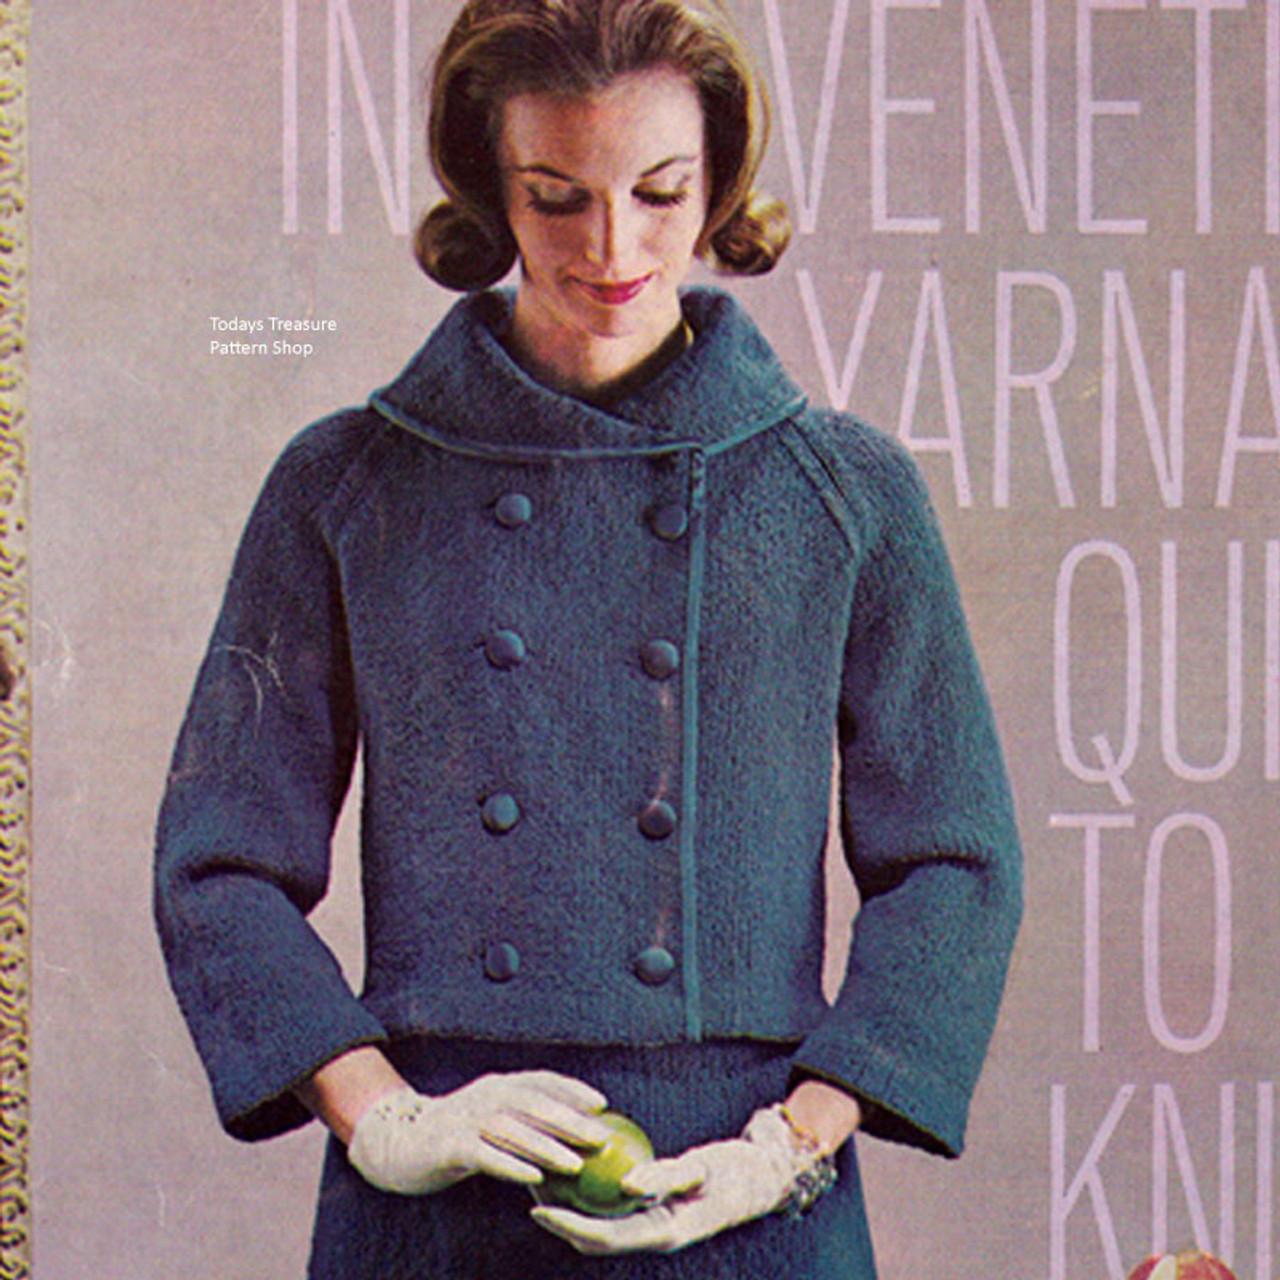 Double Breasted Jacket Knitting Pattern in Bernat Ventian